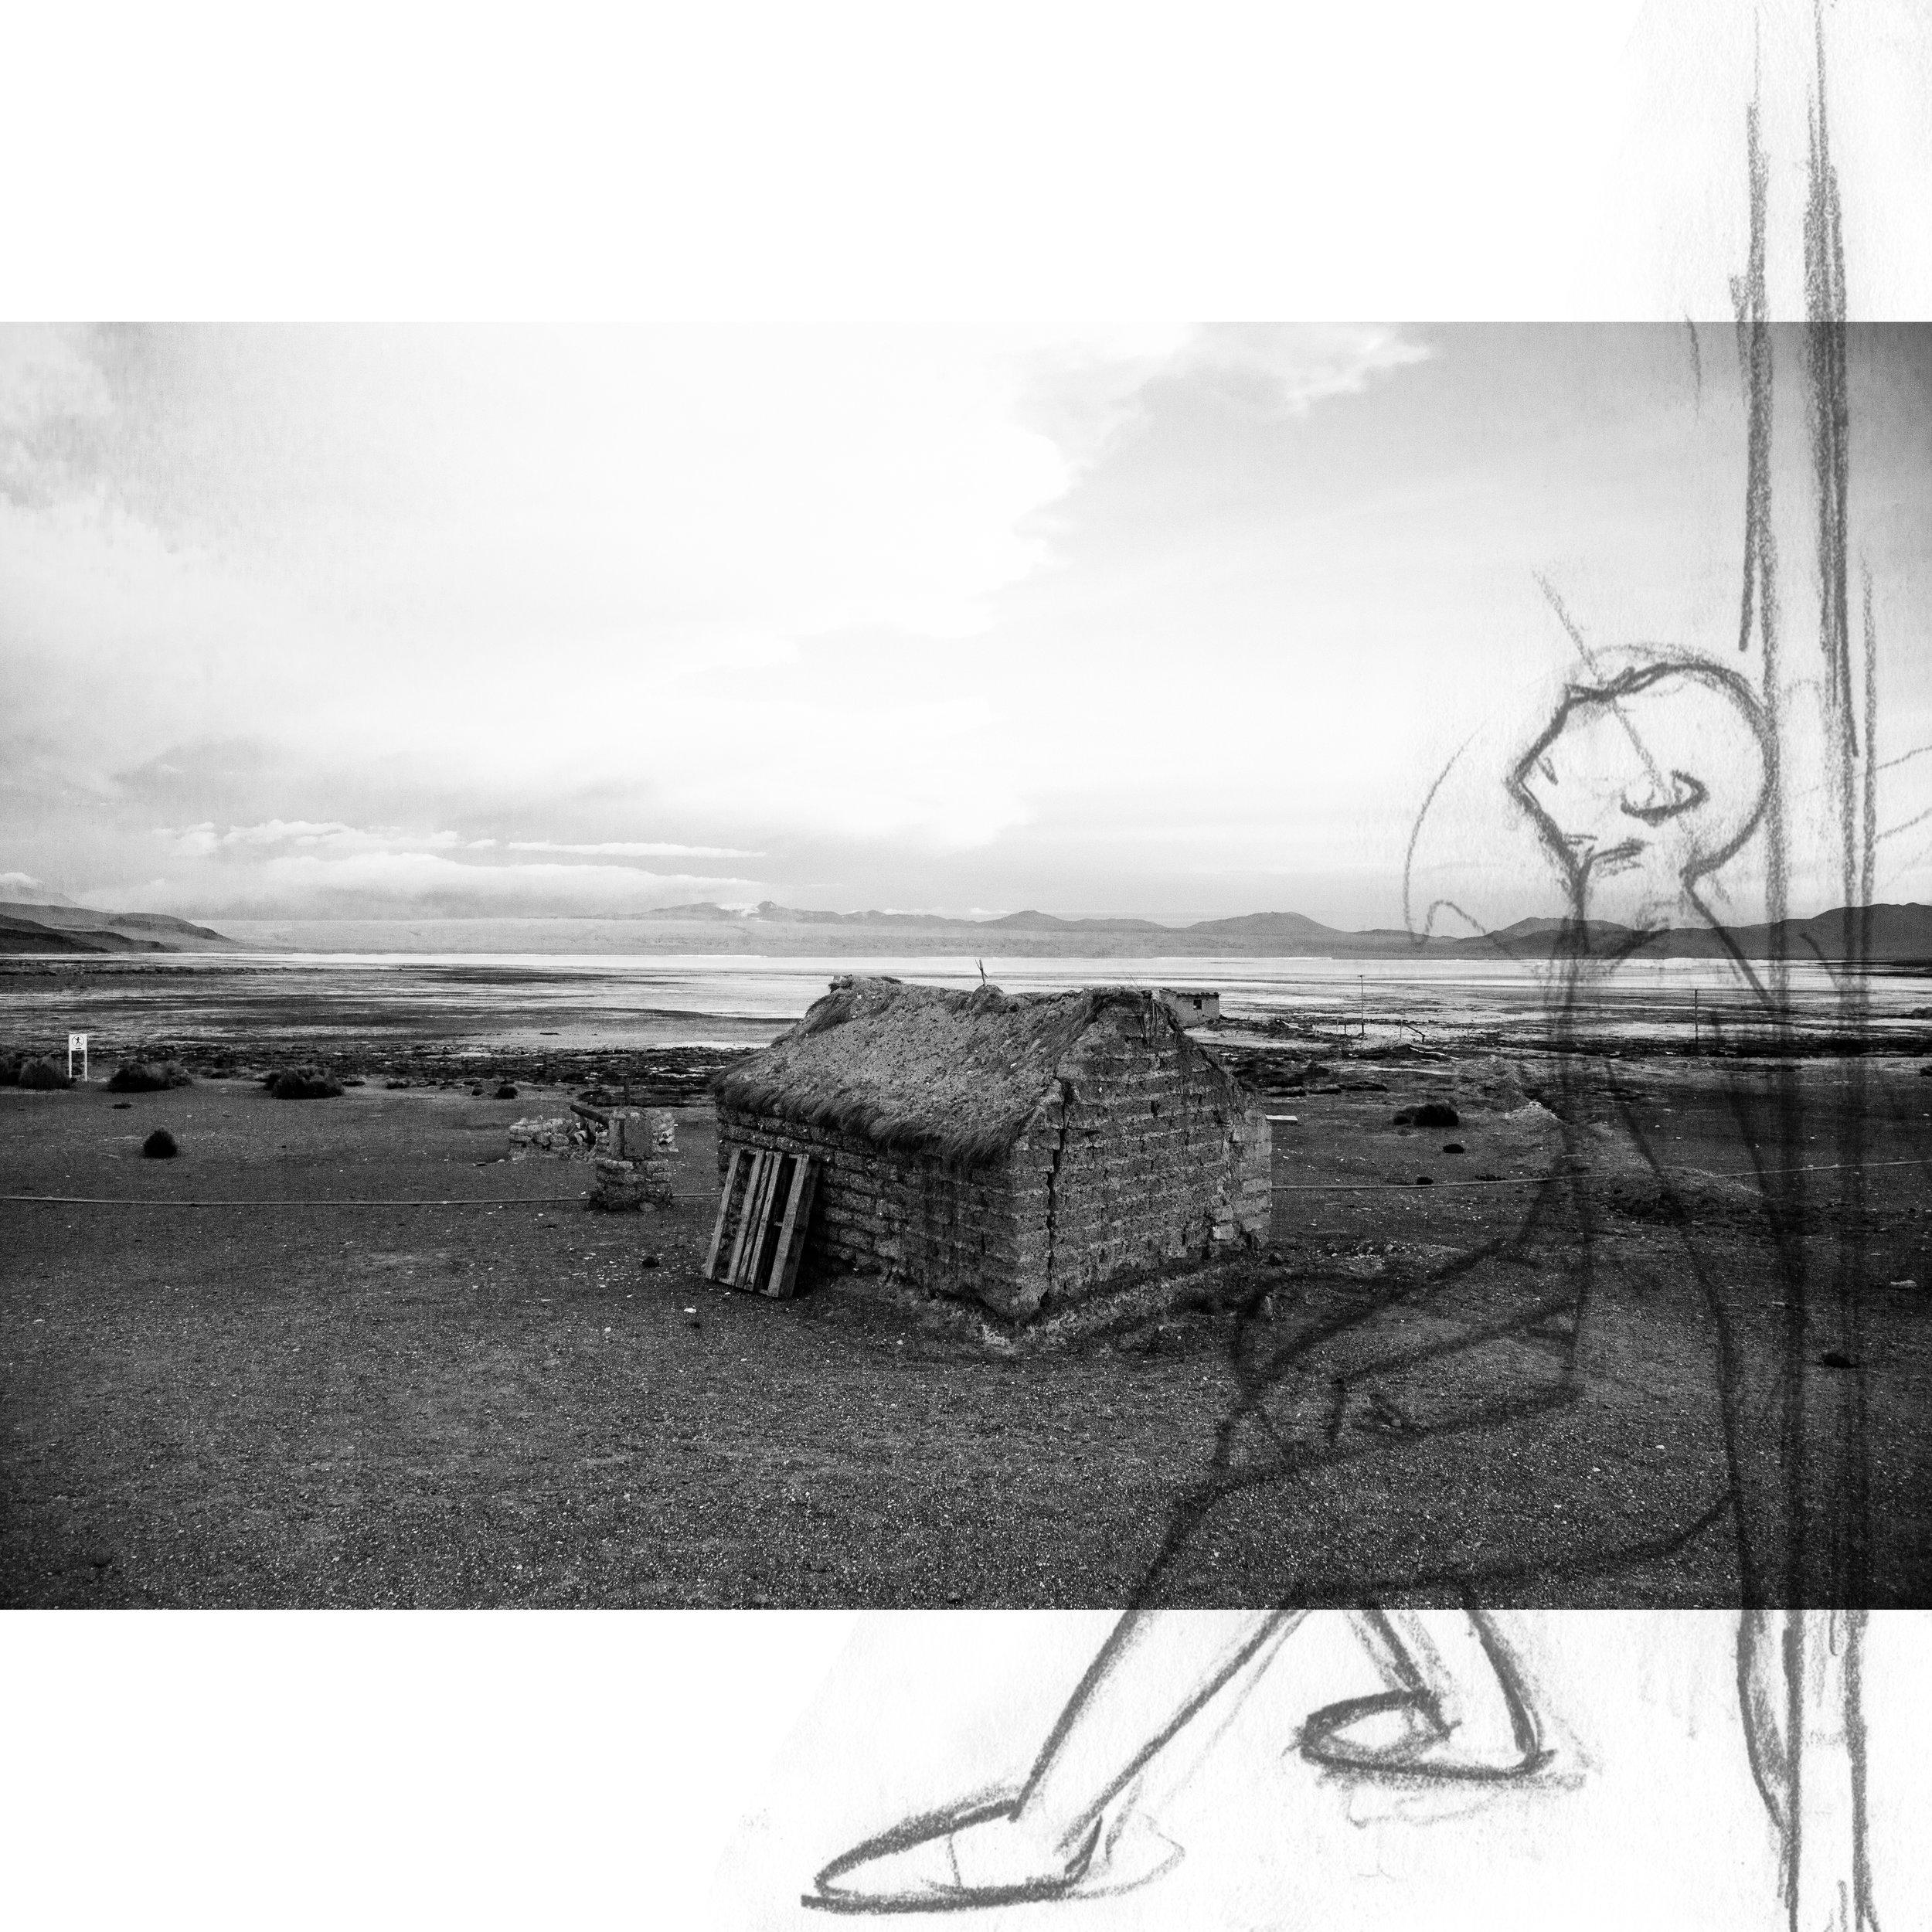 sem título / untitled - FOTOGRAFIA / TEXTO